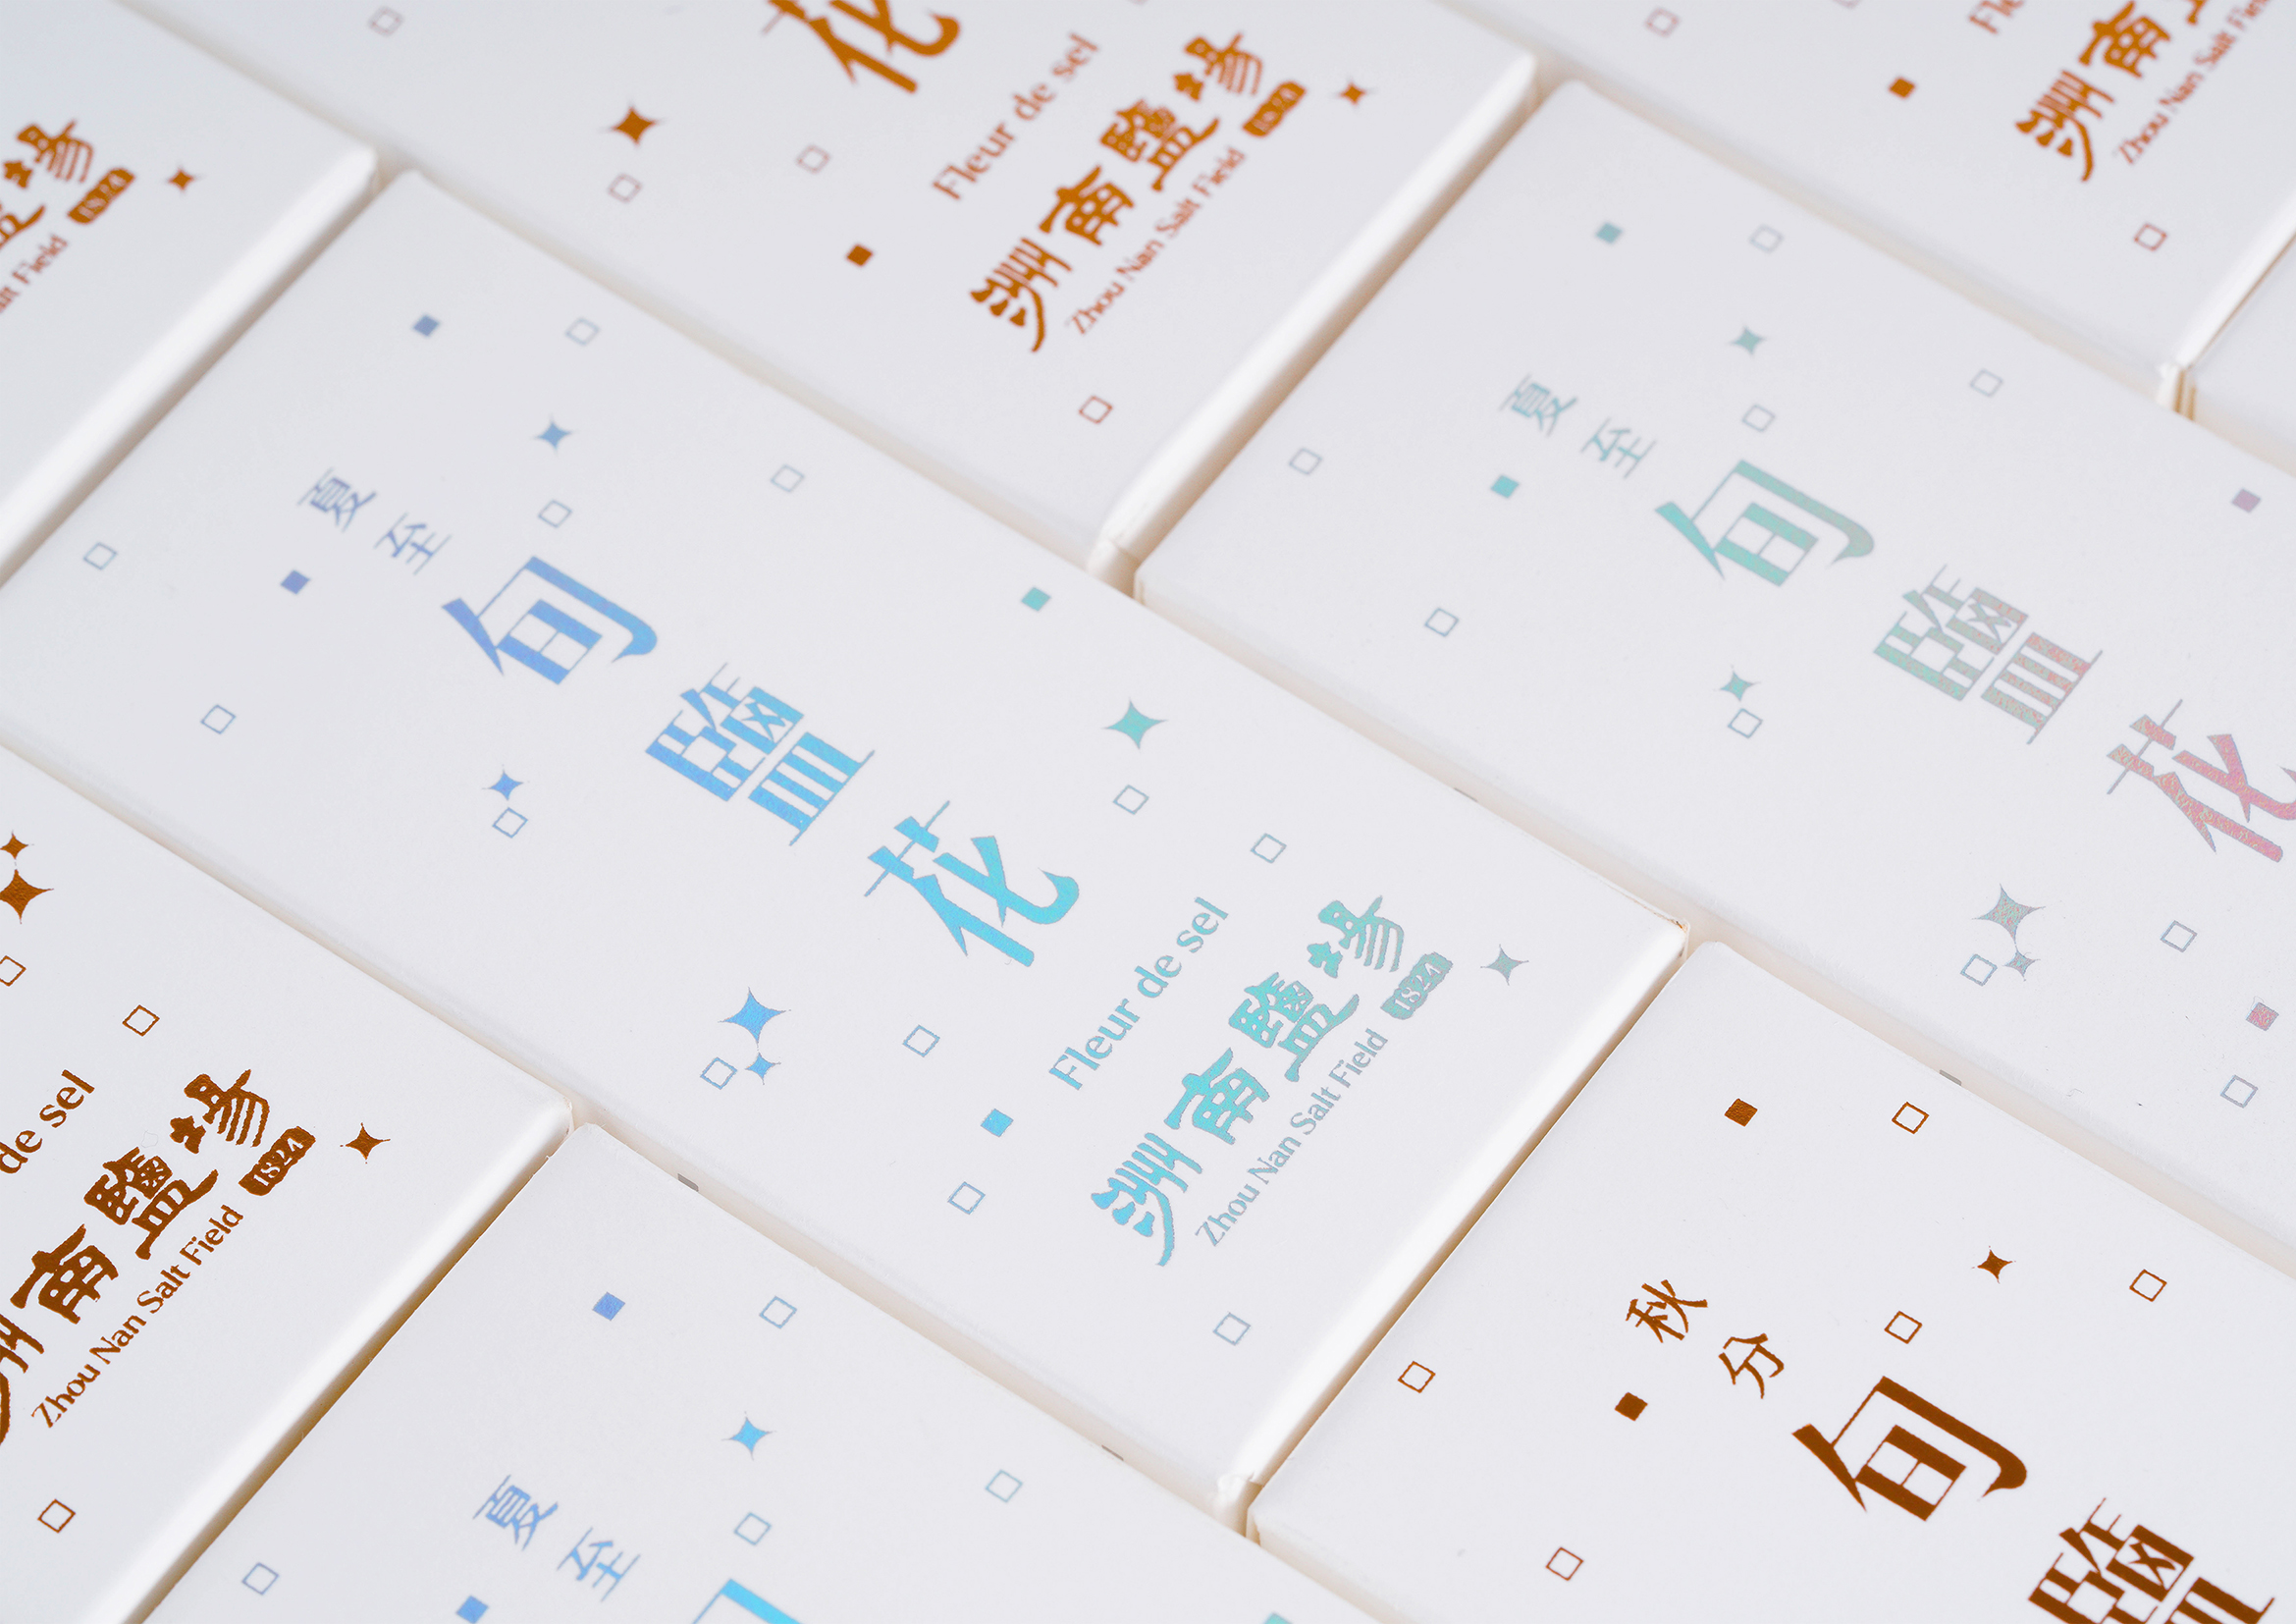 洲南鹽場 旬鹽花 Fleur De Sel of the 24 solar terms